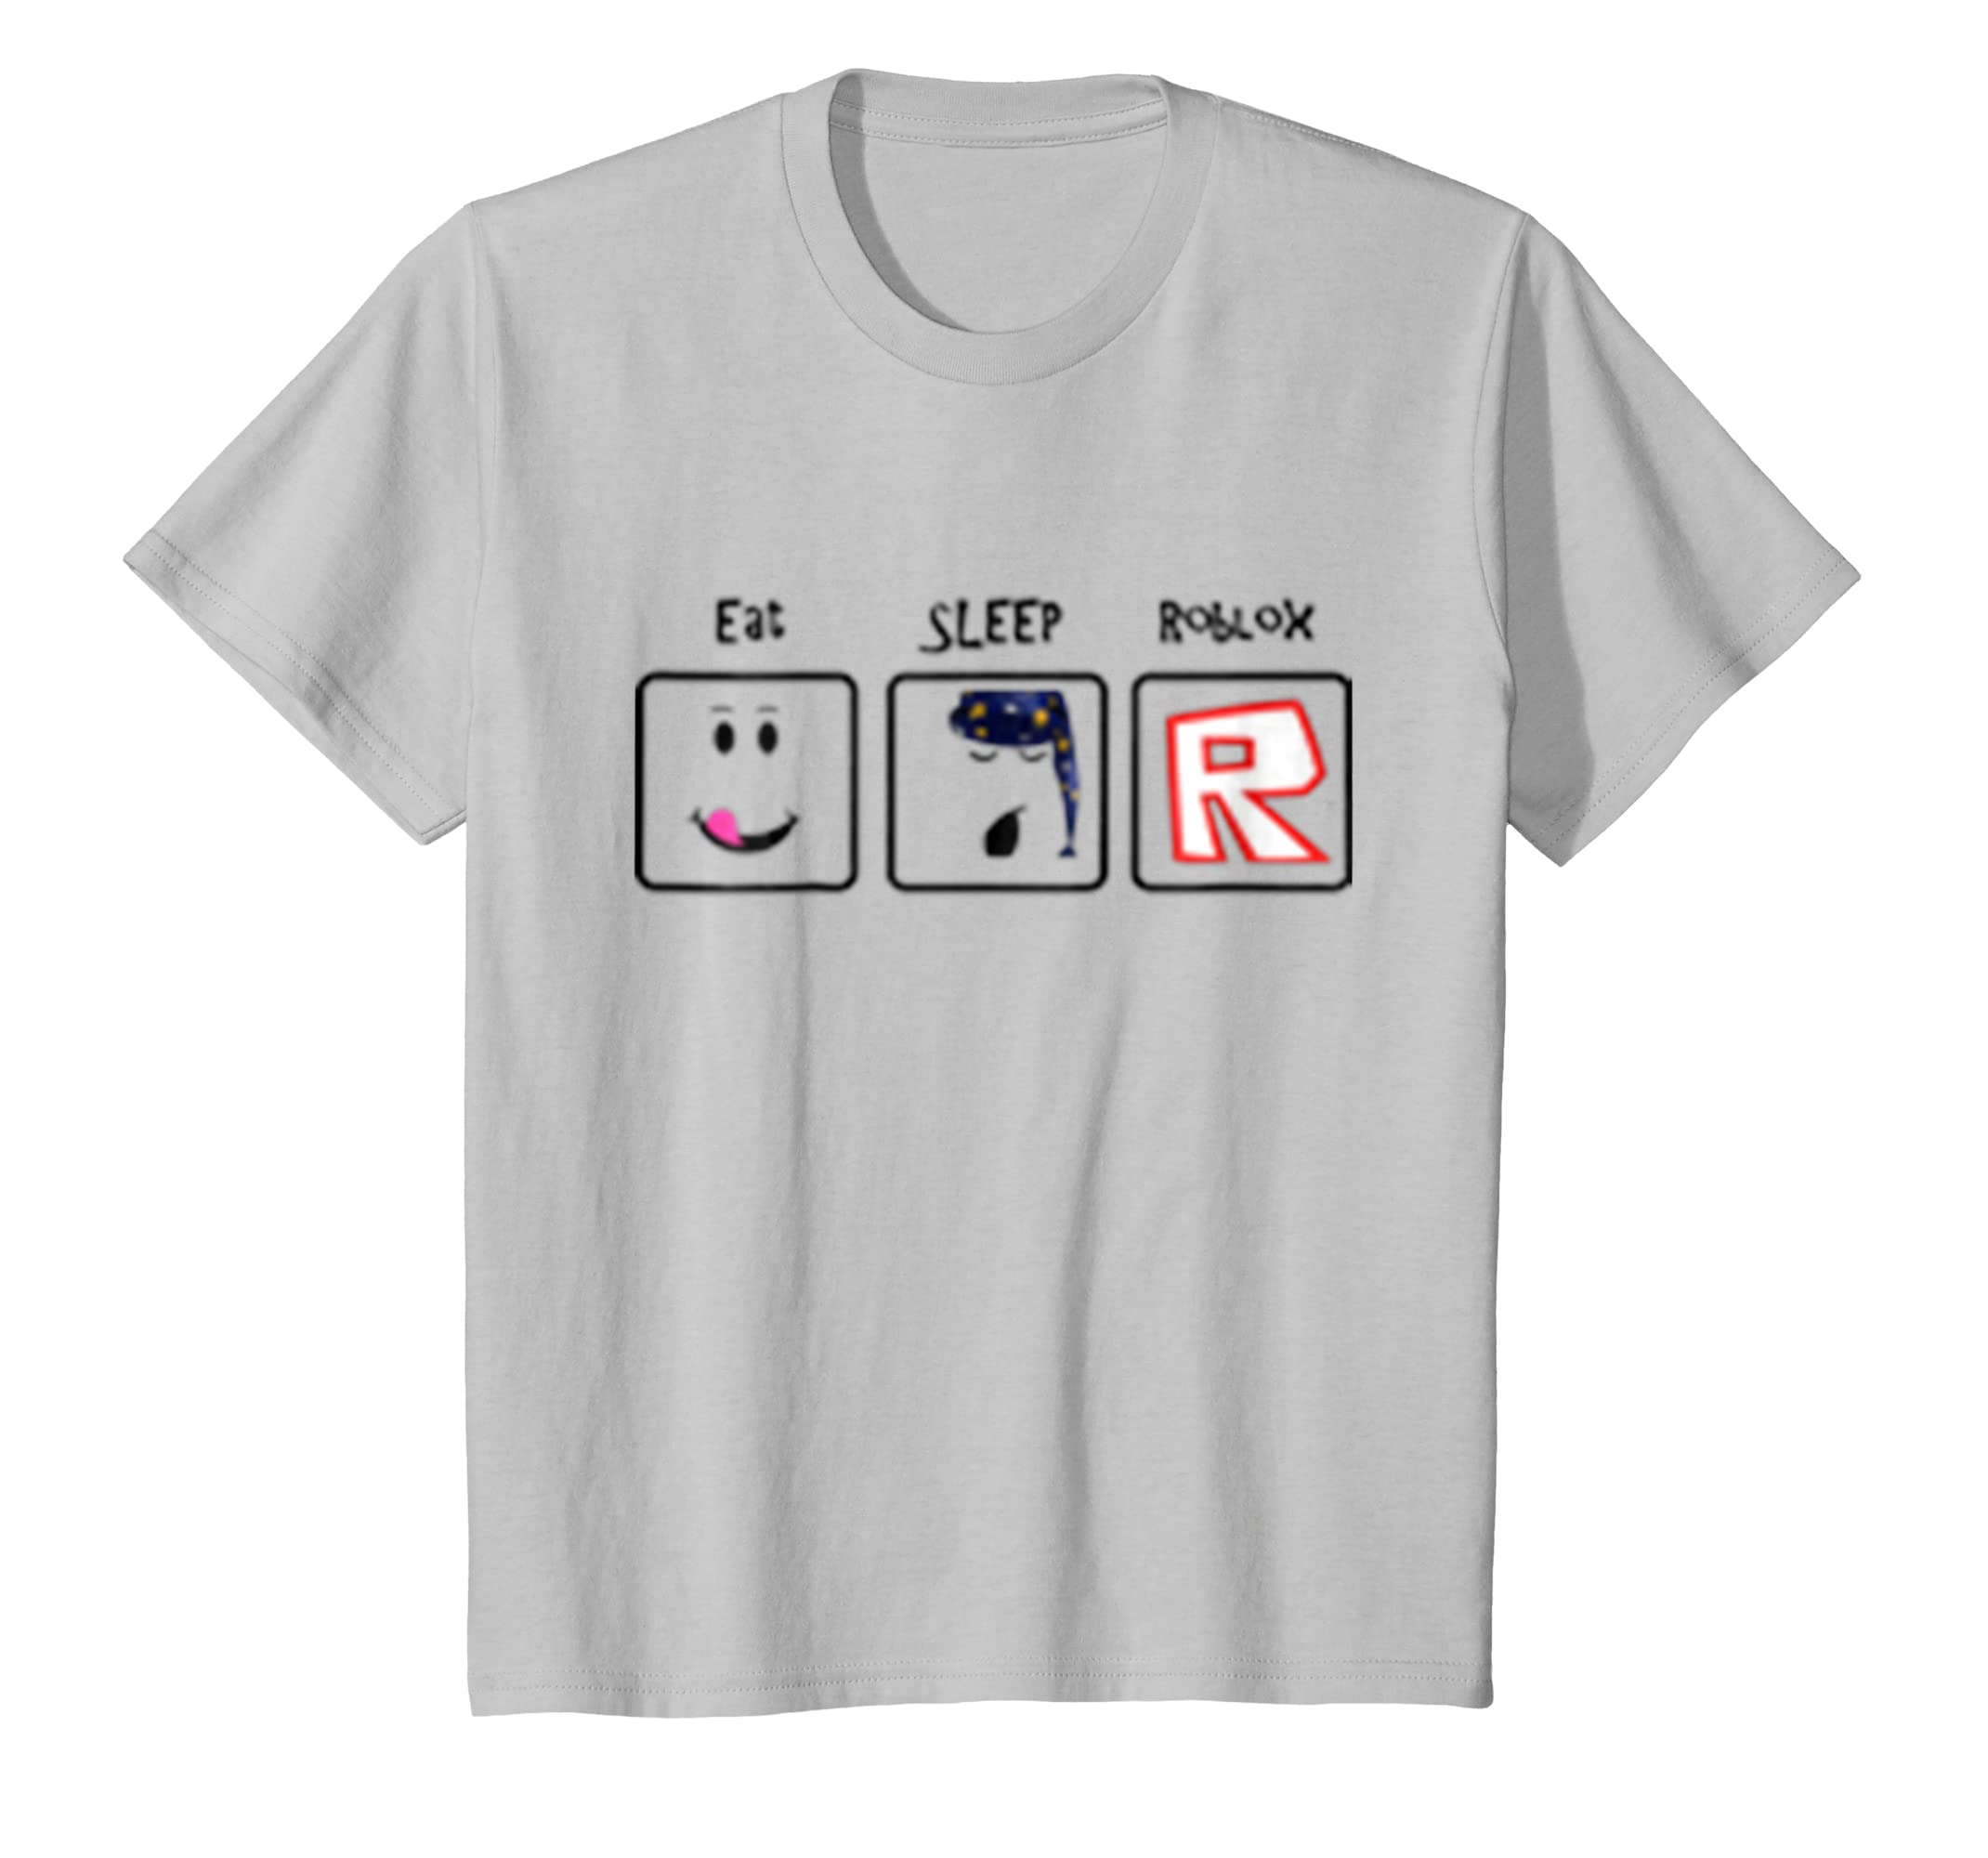 Kids Loves Eat.Sleep Roblox, Tshirt-Newstyleth